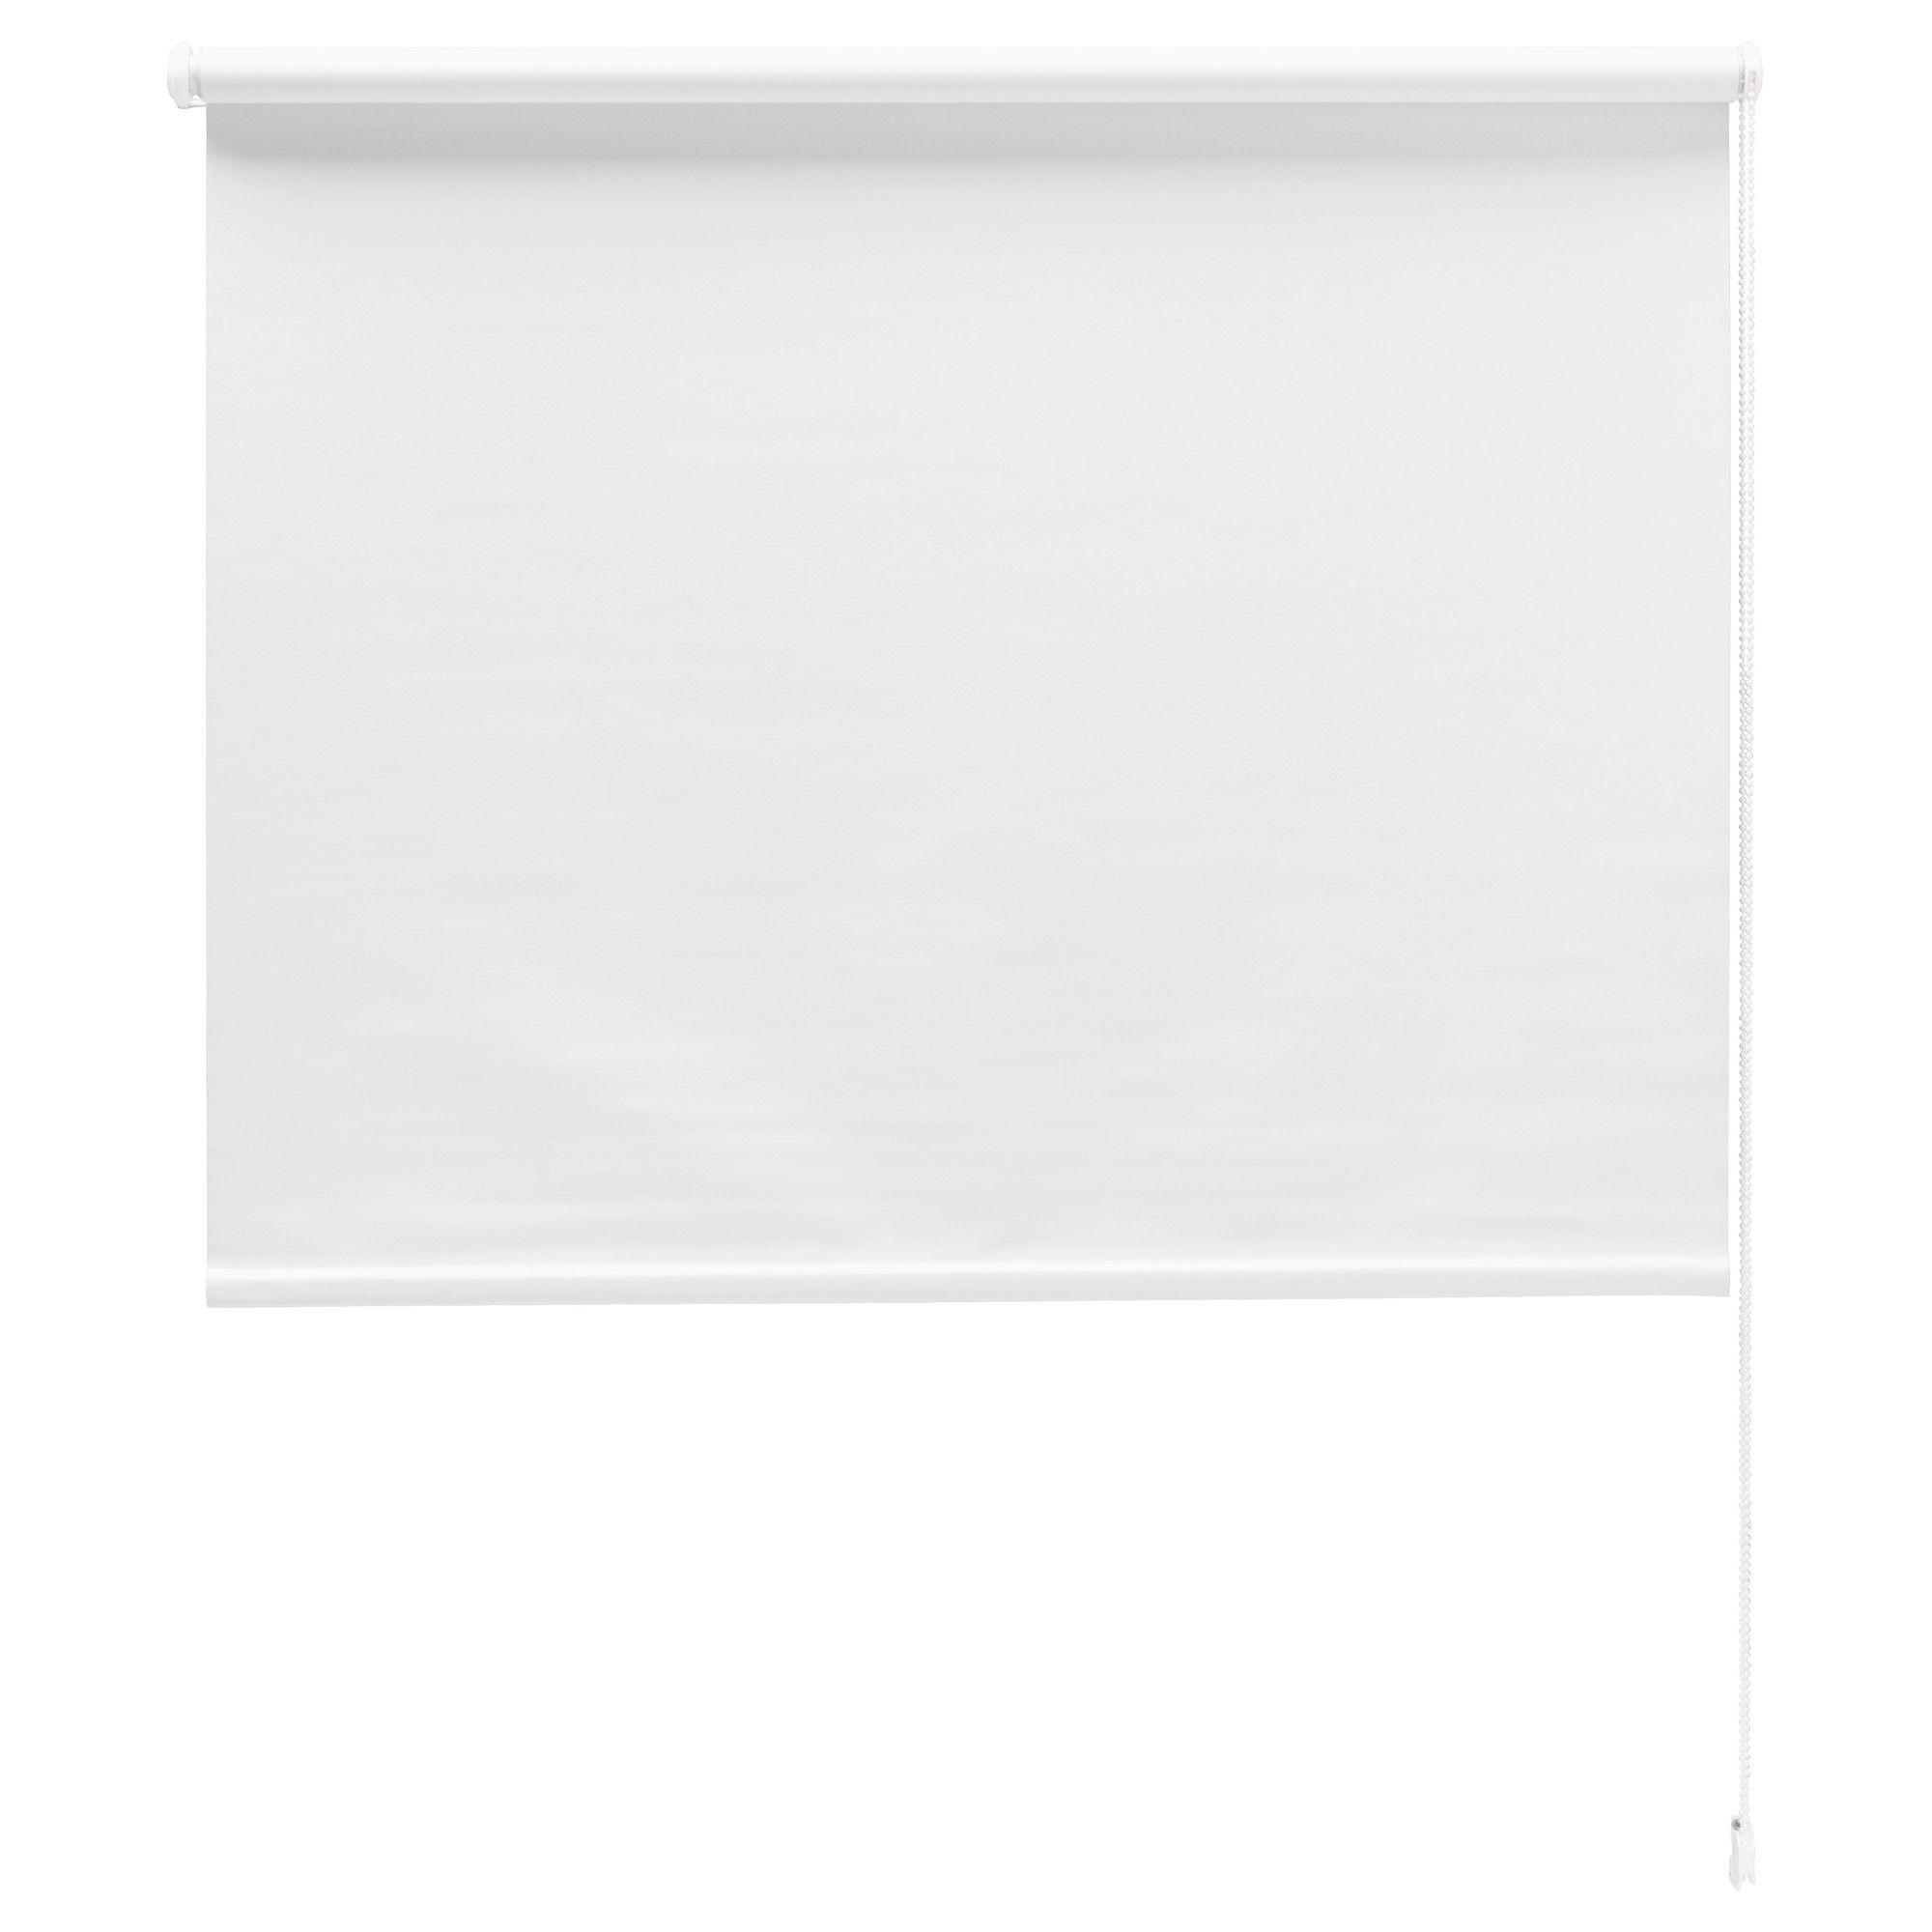 Tupplur Roller Blind  White, 180X195 Cm  Ikea